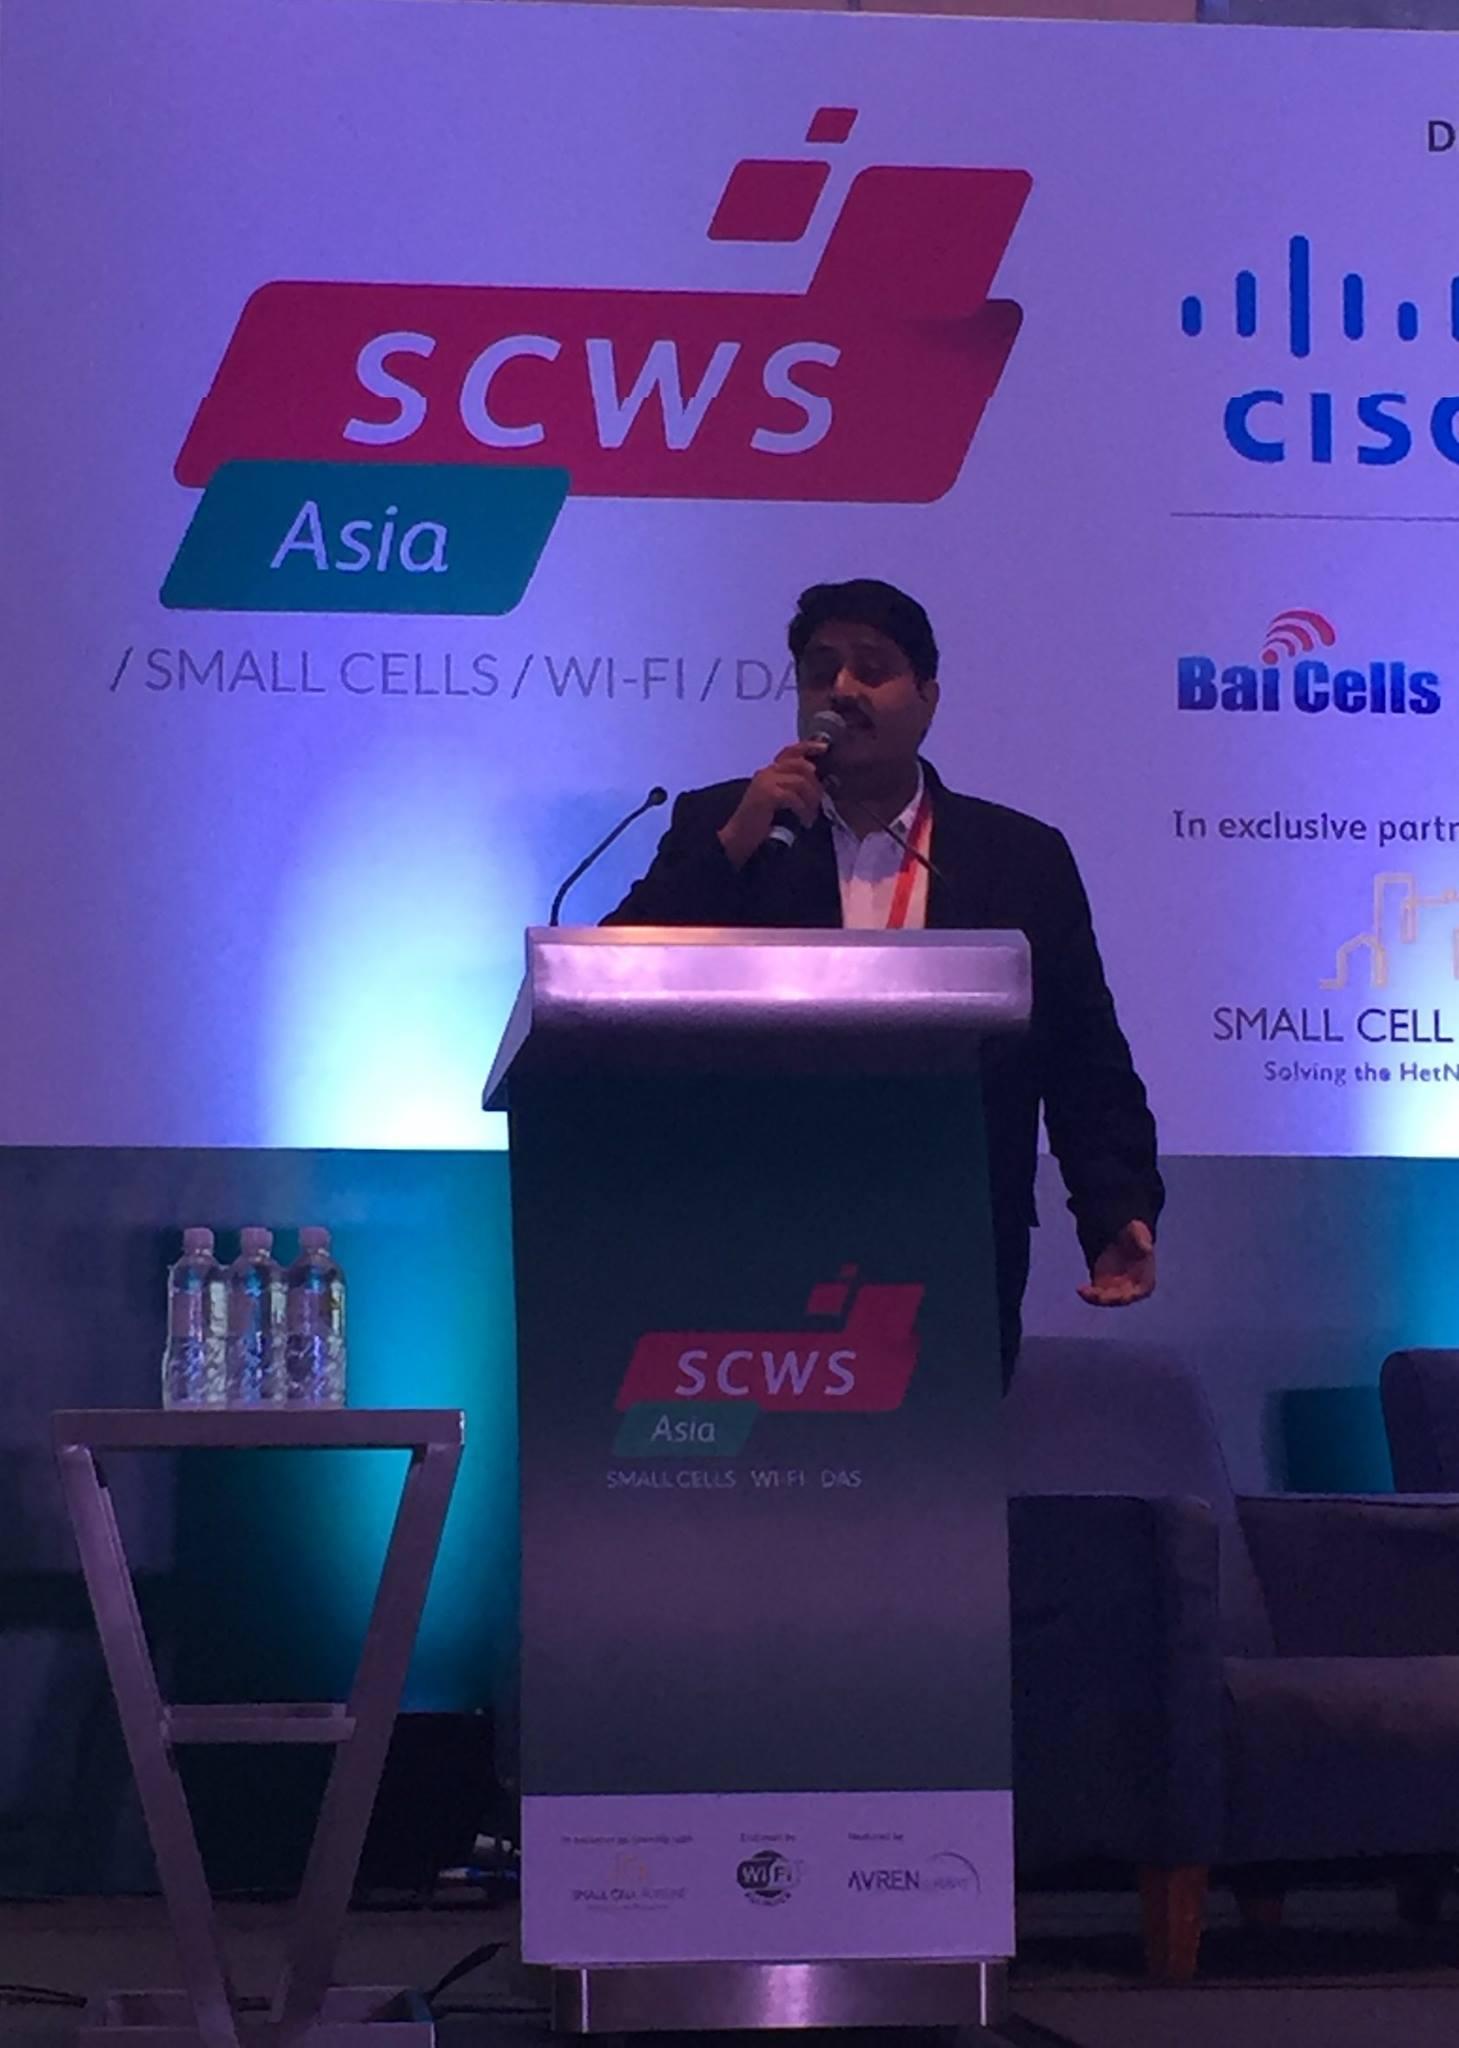 SCWS Asia 2016